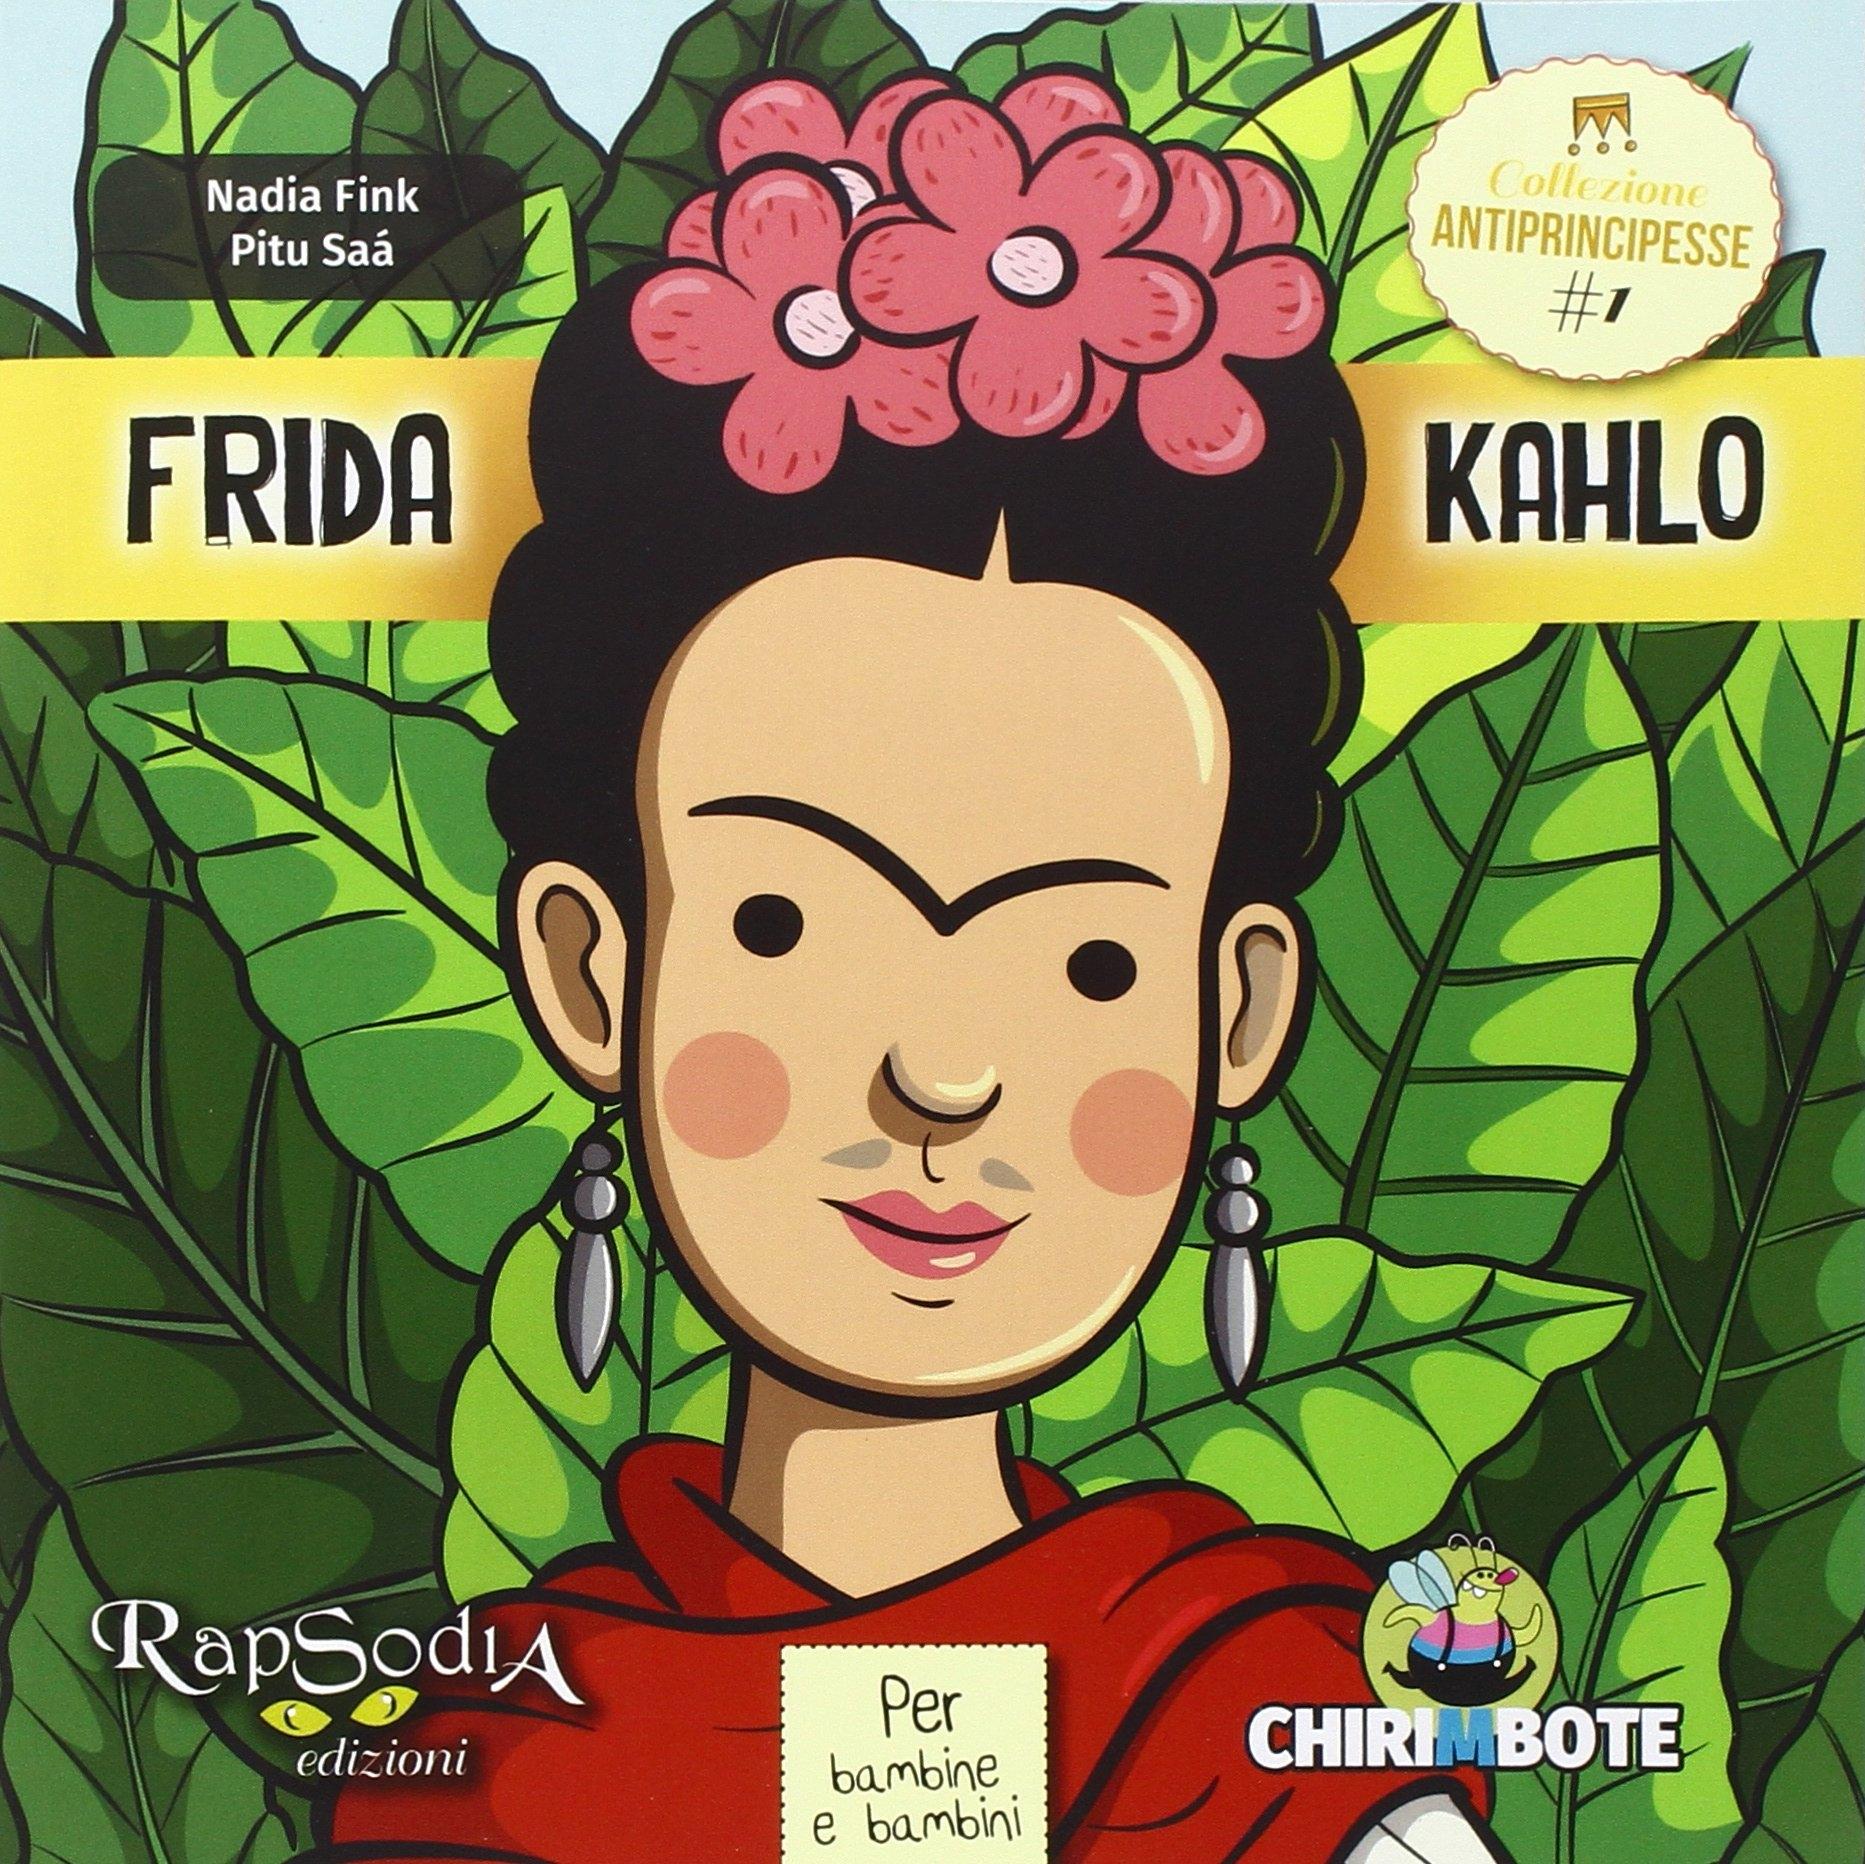 Frida Kahlo. Collezione antiprincipesse